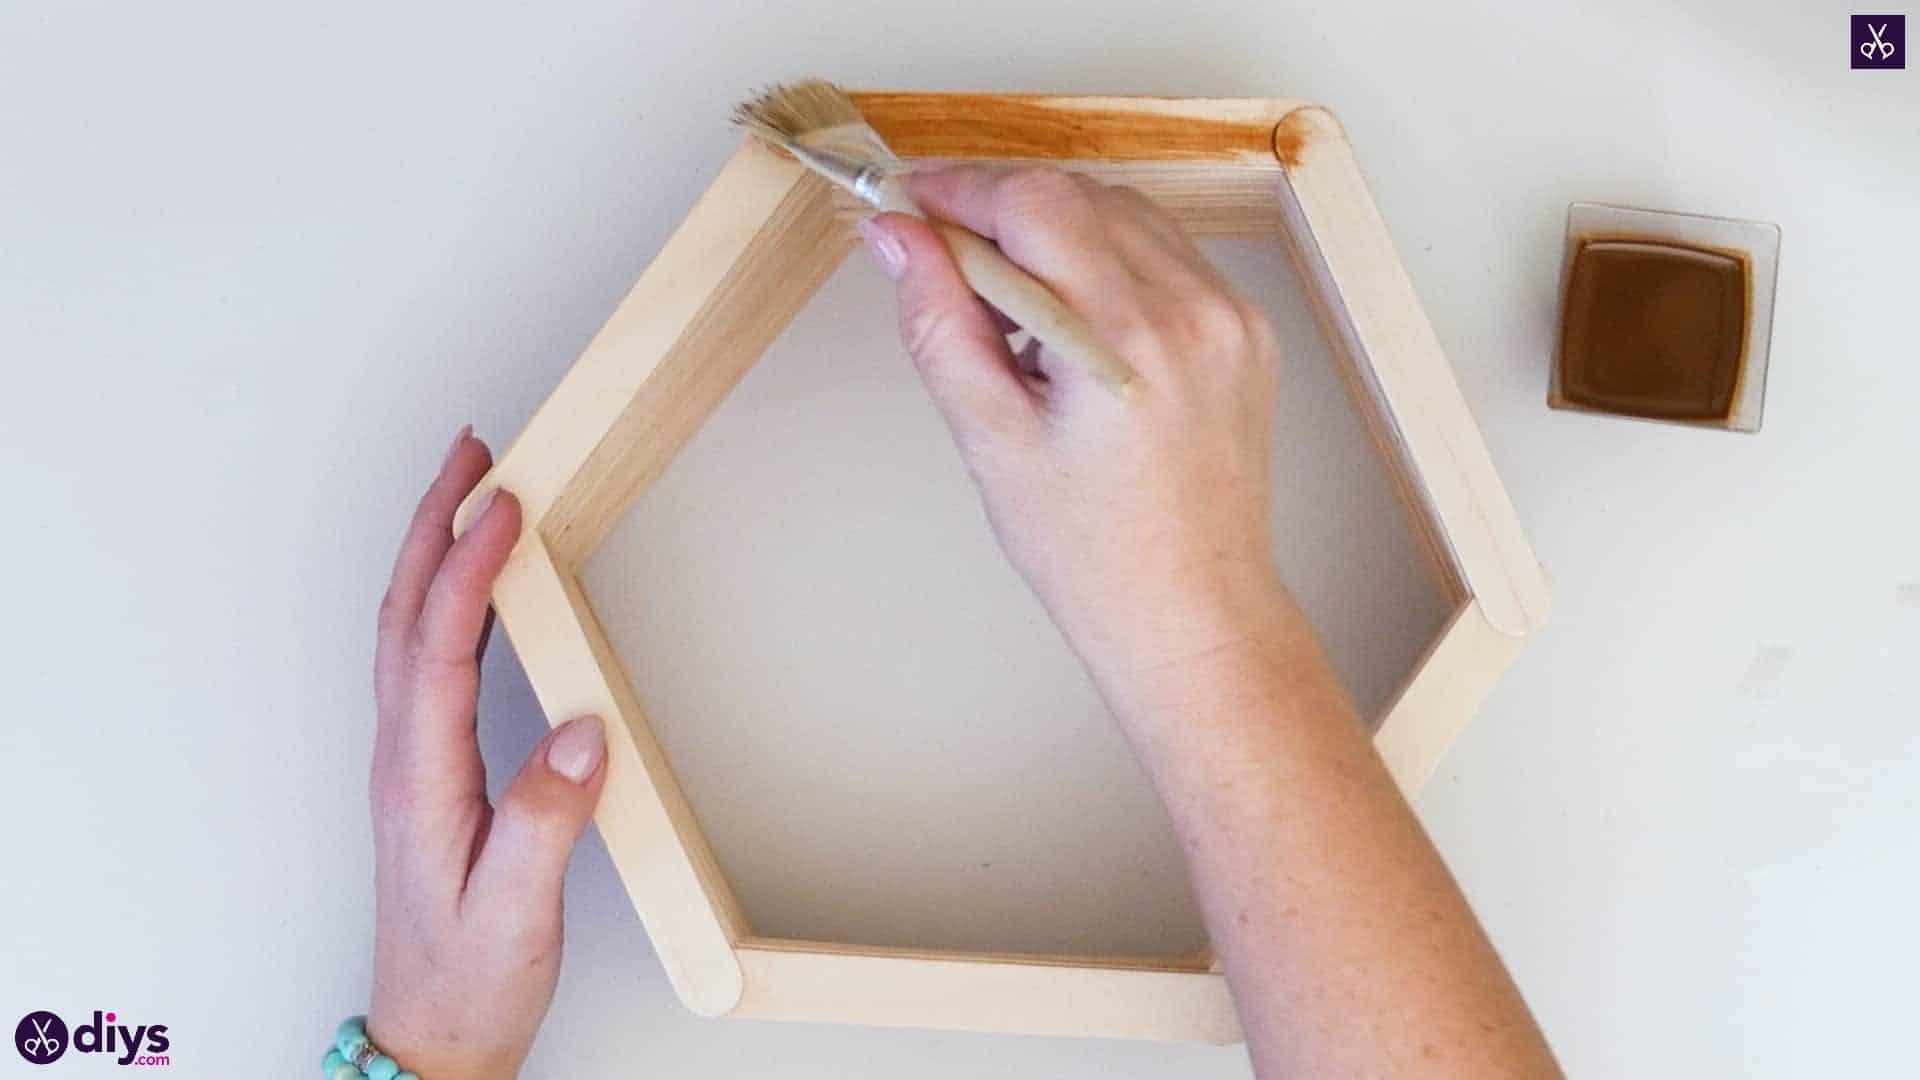 Diy popsicle stick hexagon shelf step 4